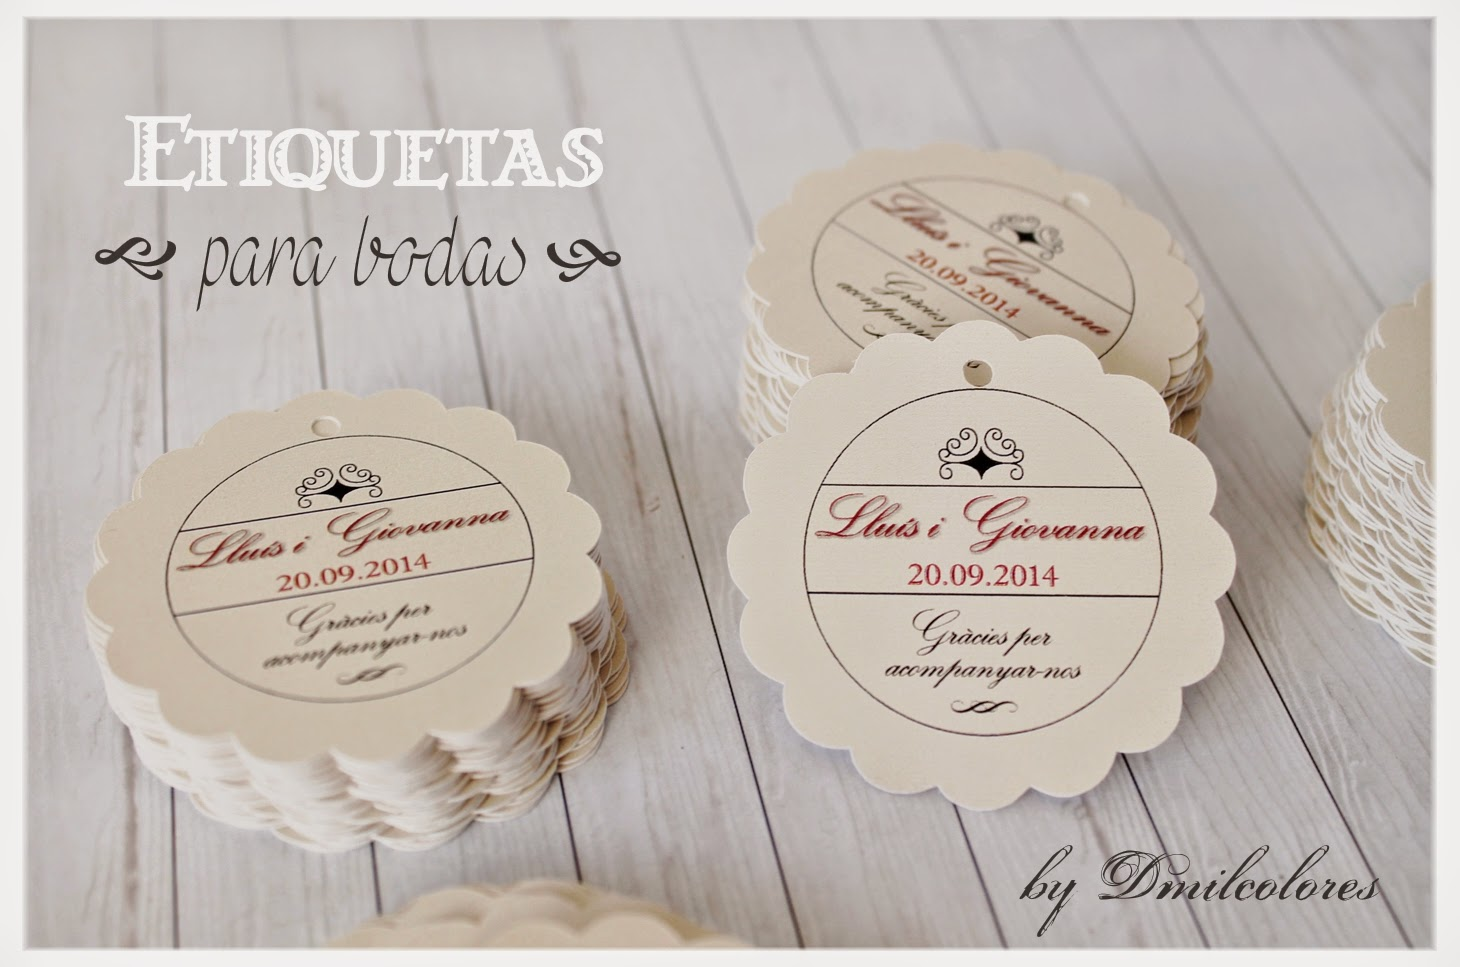 Etiquetas para boda dmilcolores detalles - Etiquetas para regalos para imprimir ...